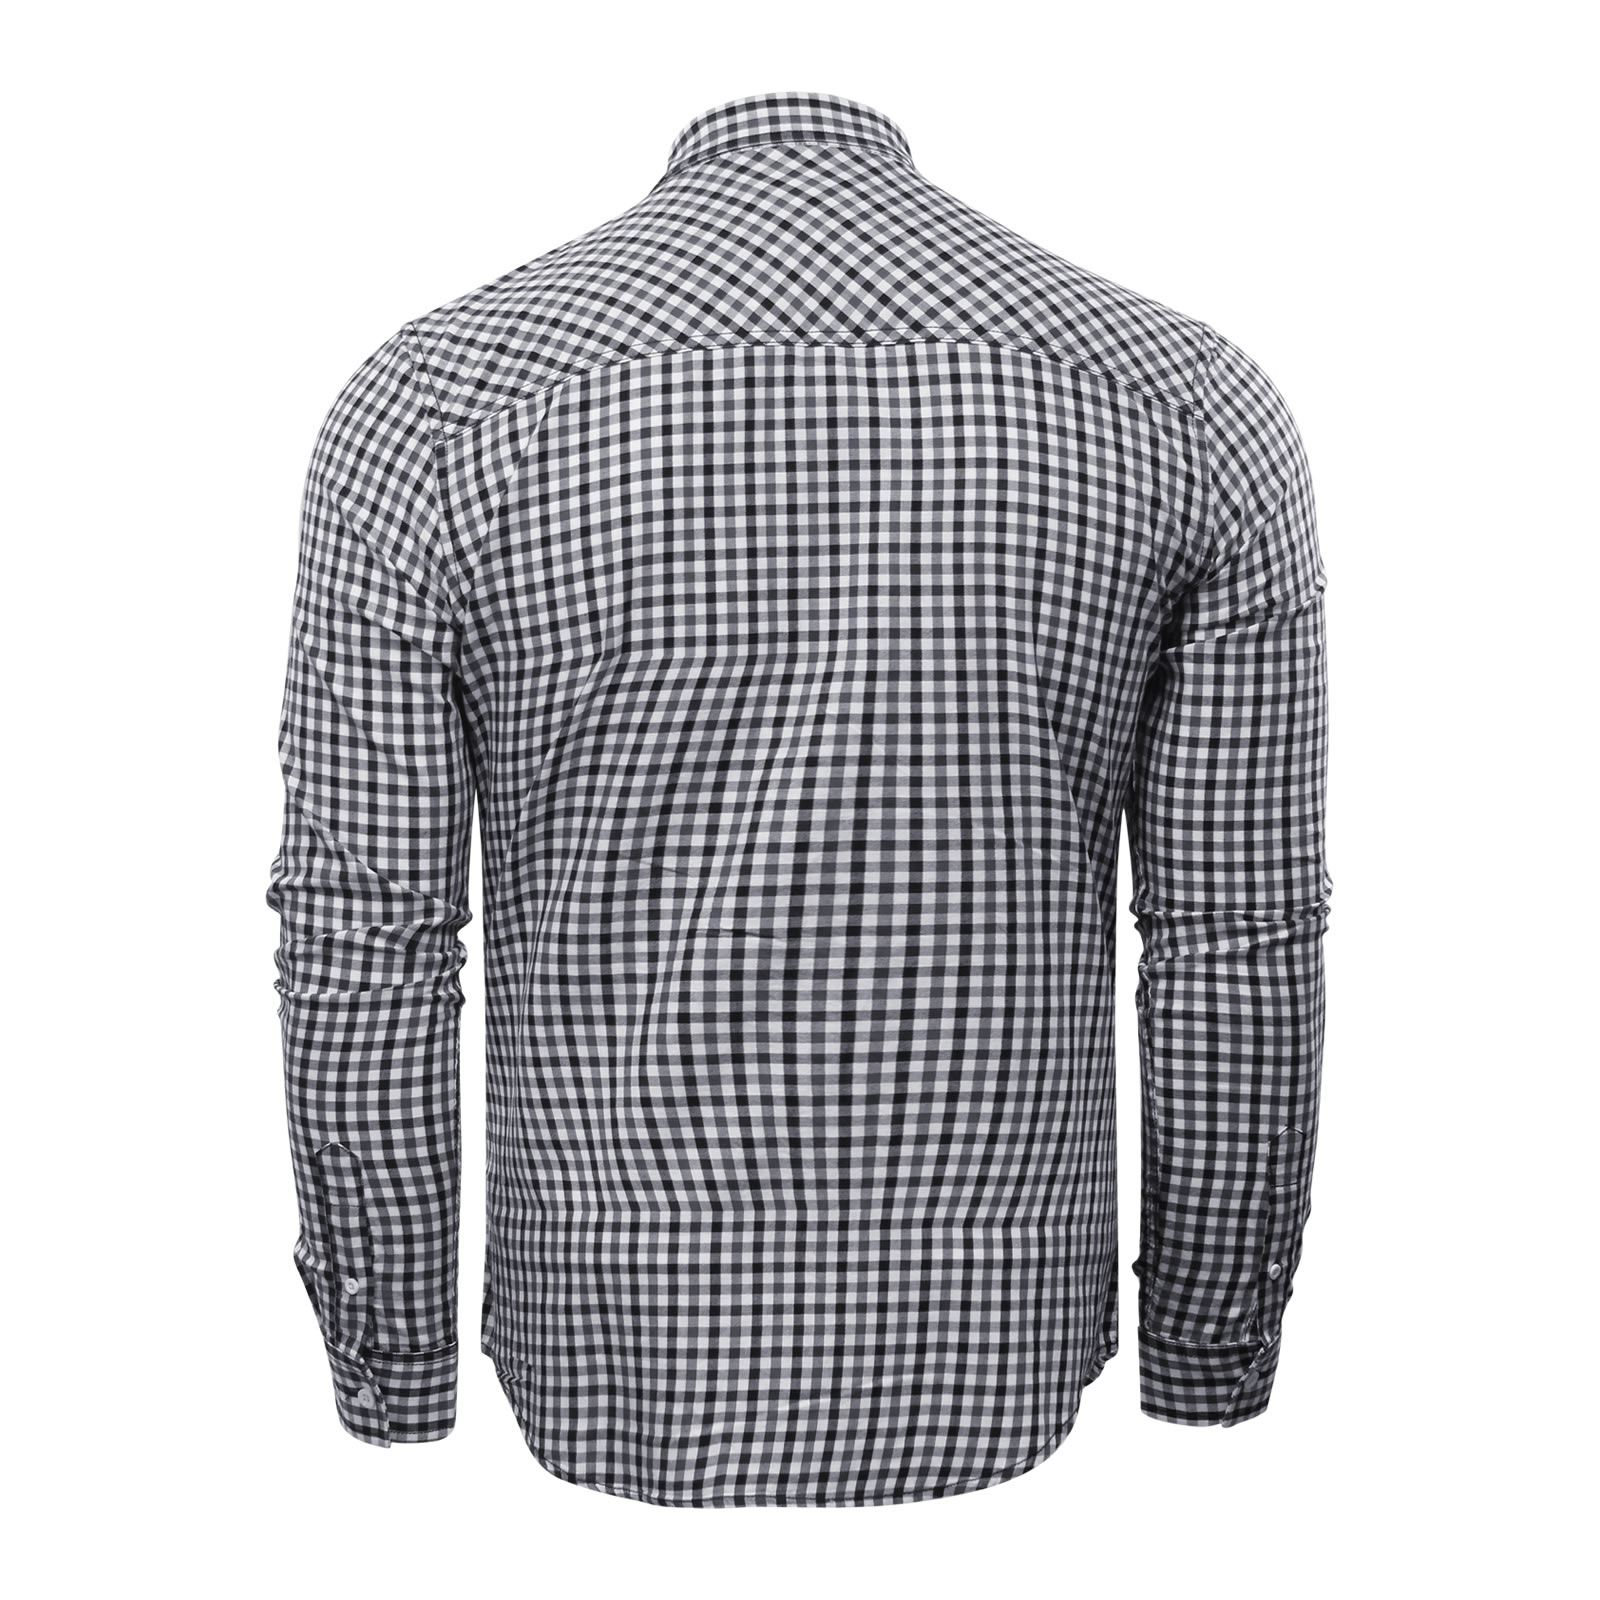 Crosshatch LARIX Mens Check camicia cotone manica lunga Top Casual